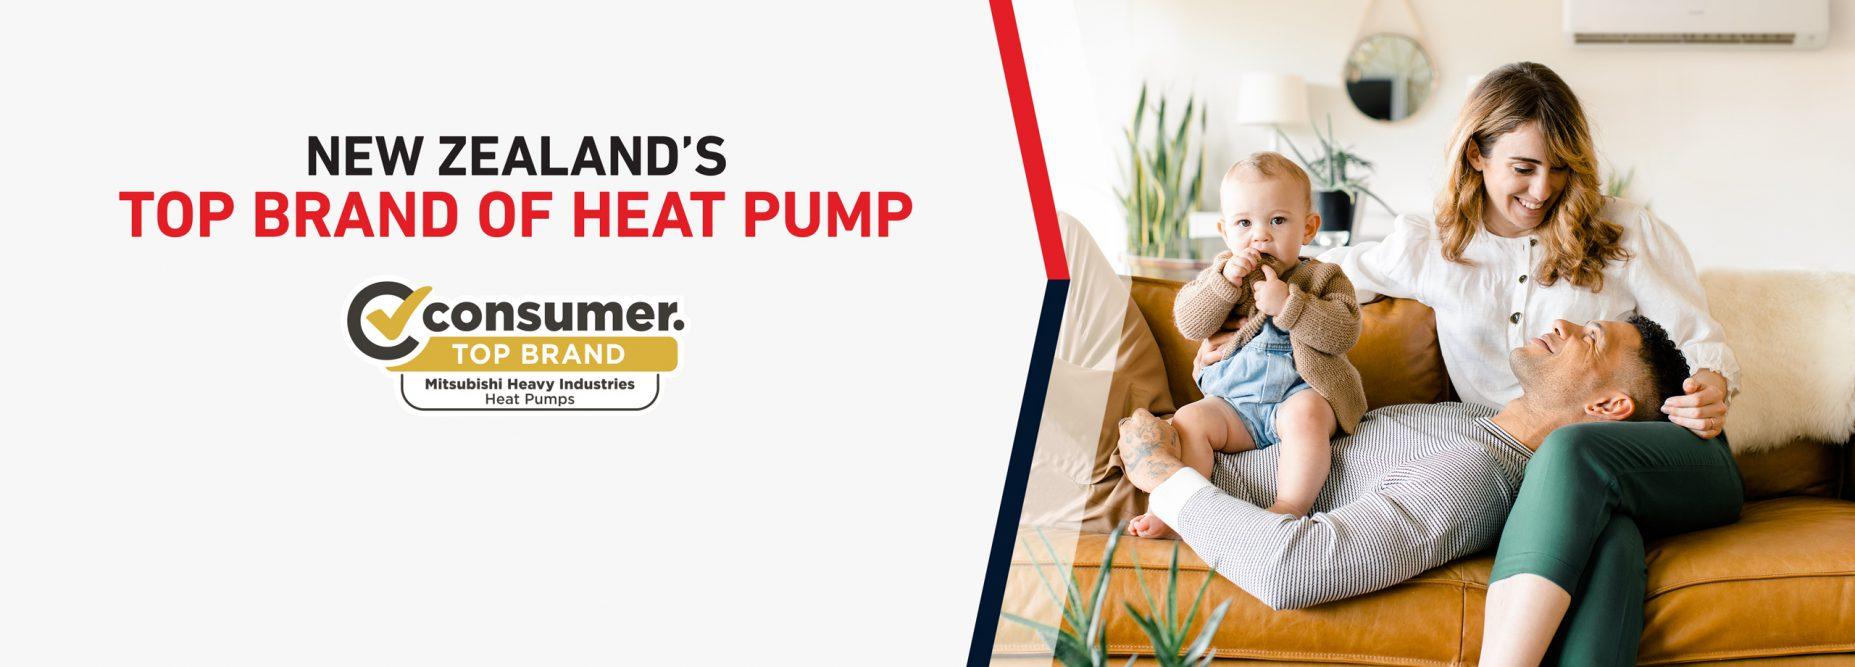 consumer top brand heat pumps header for desktop